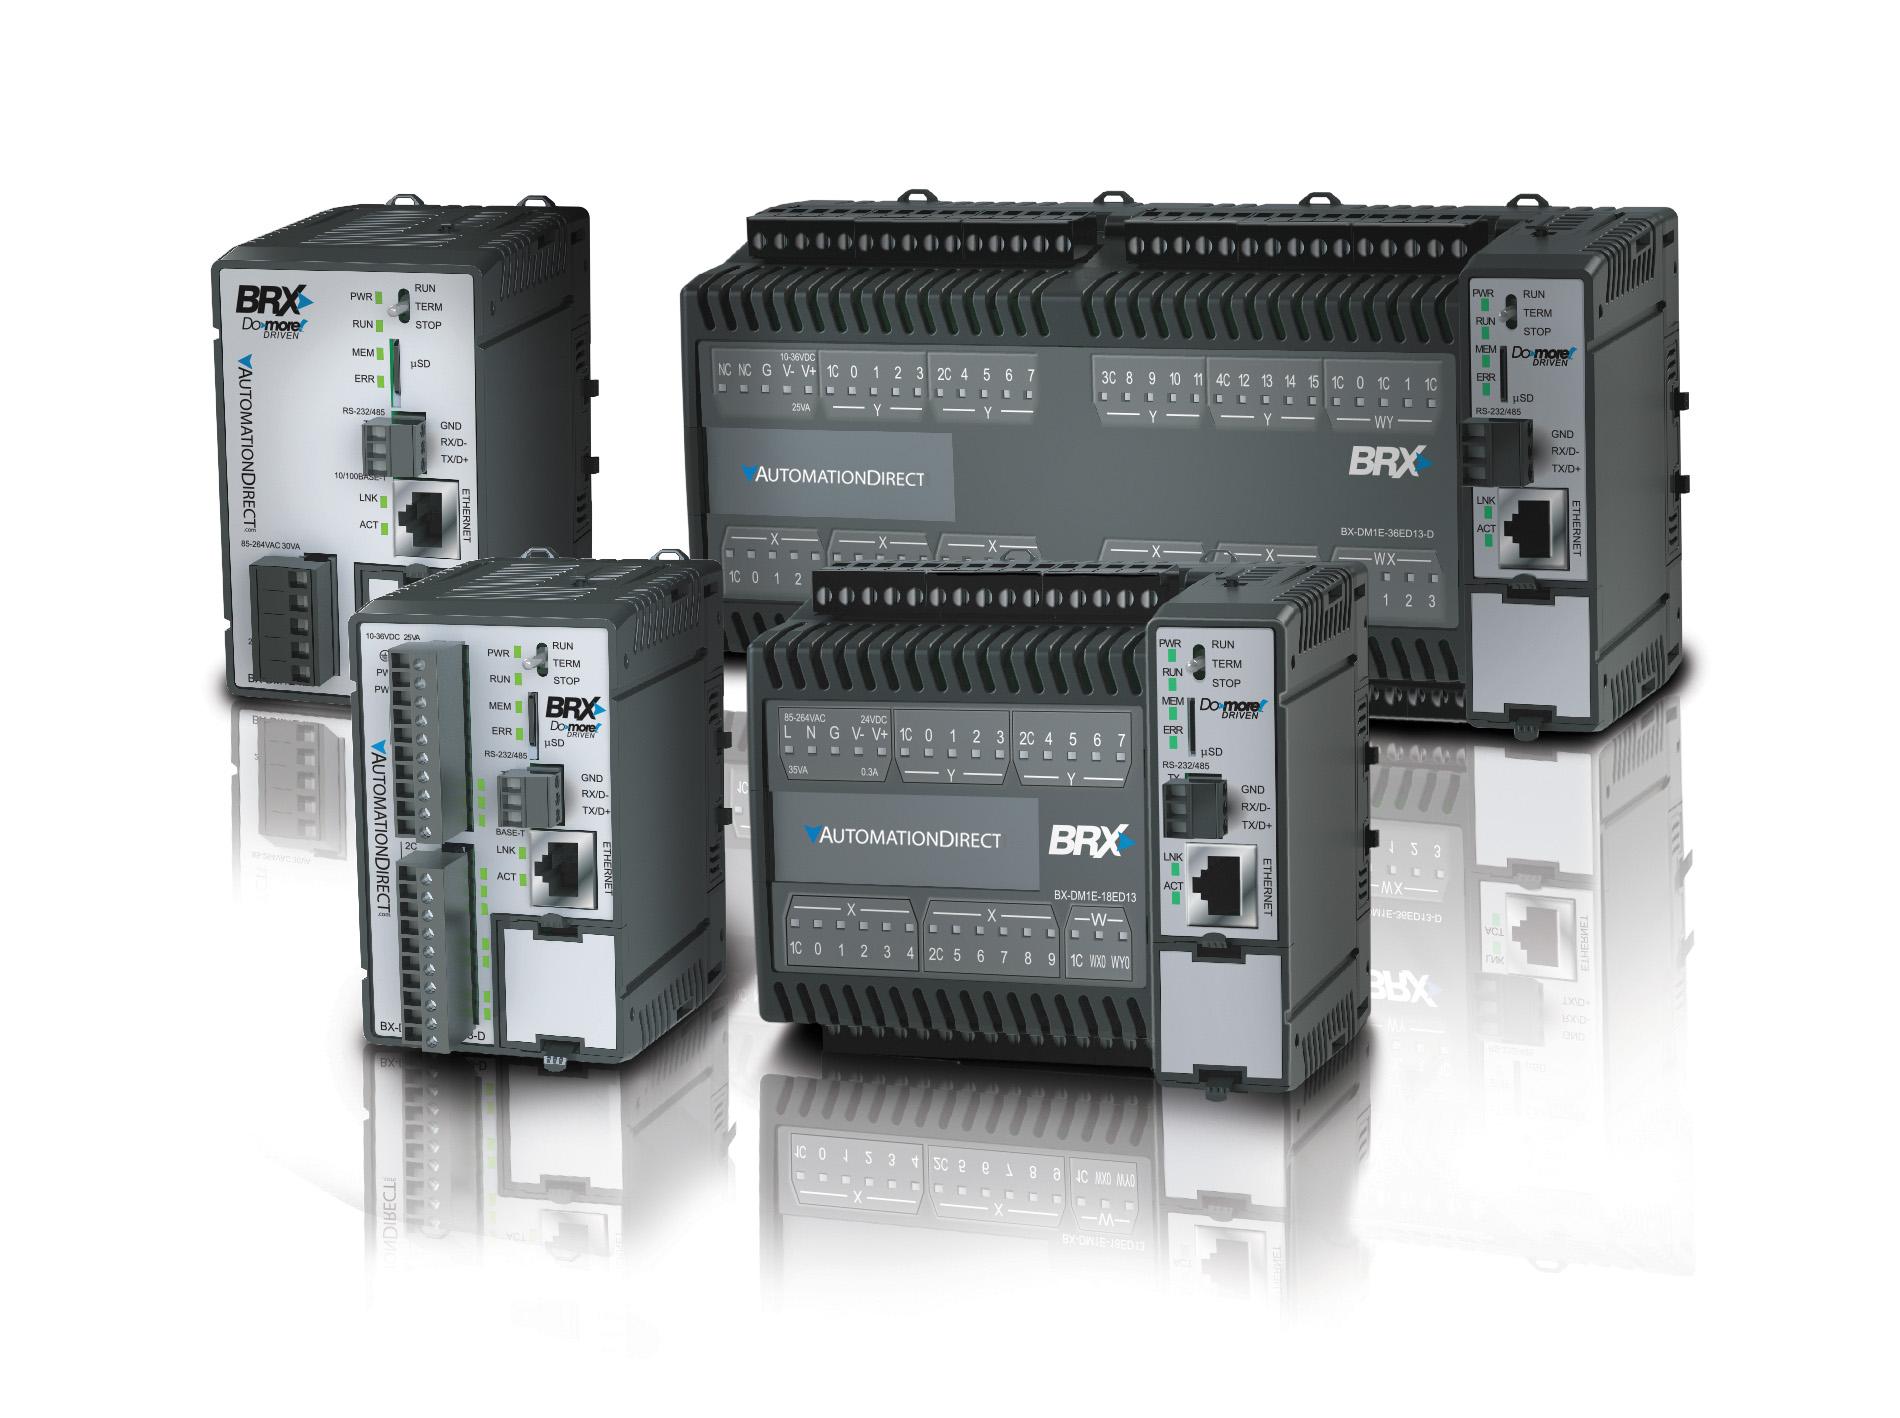 контроллеры семейства Do-more BRX Micro компании AutomationDirect